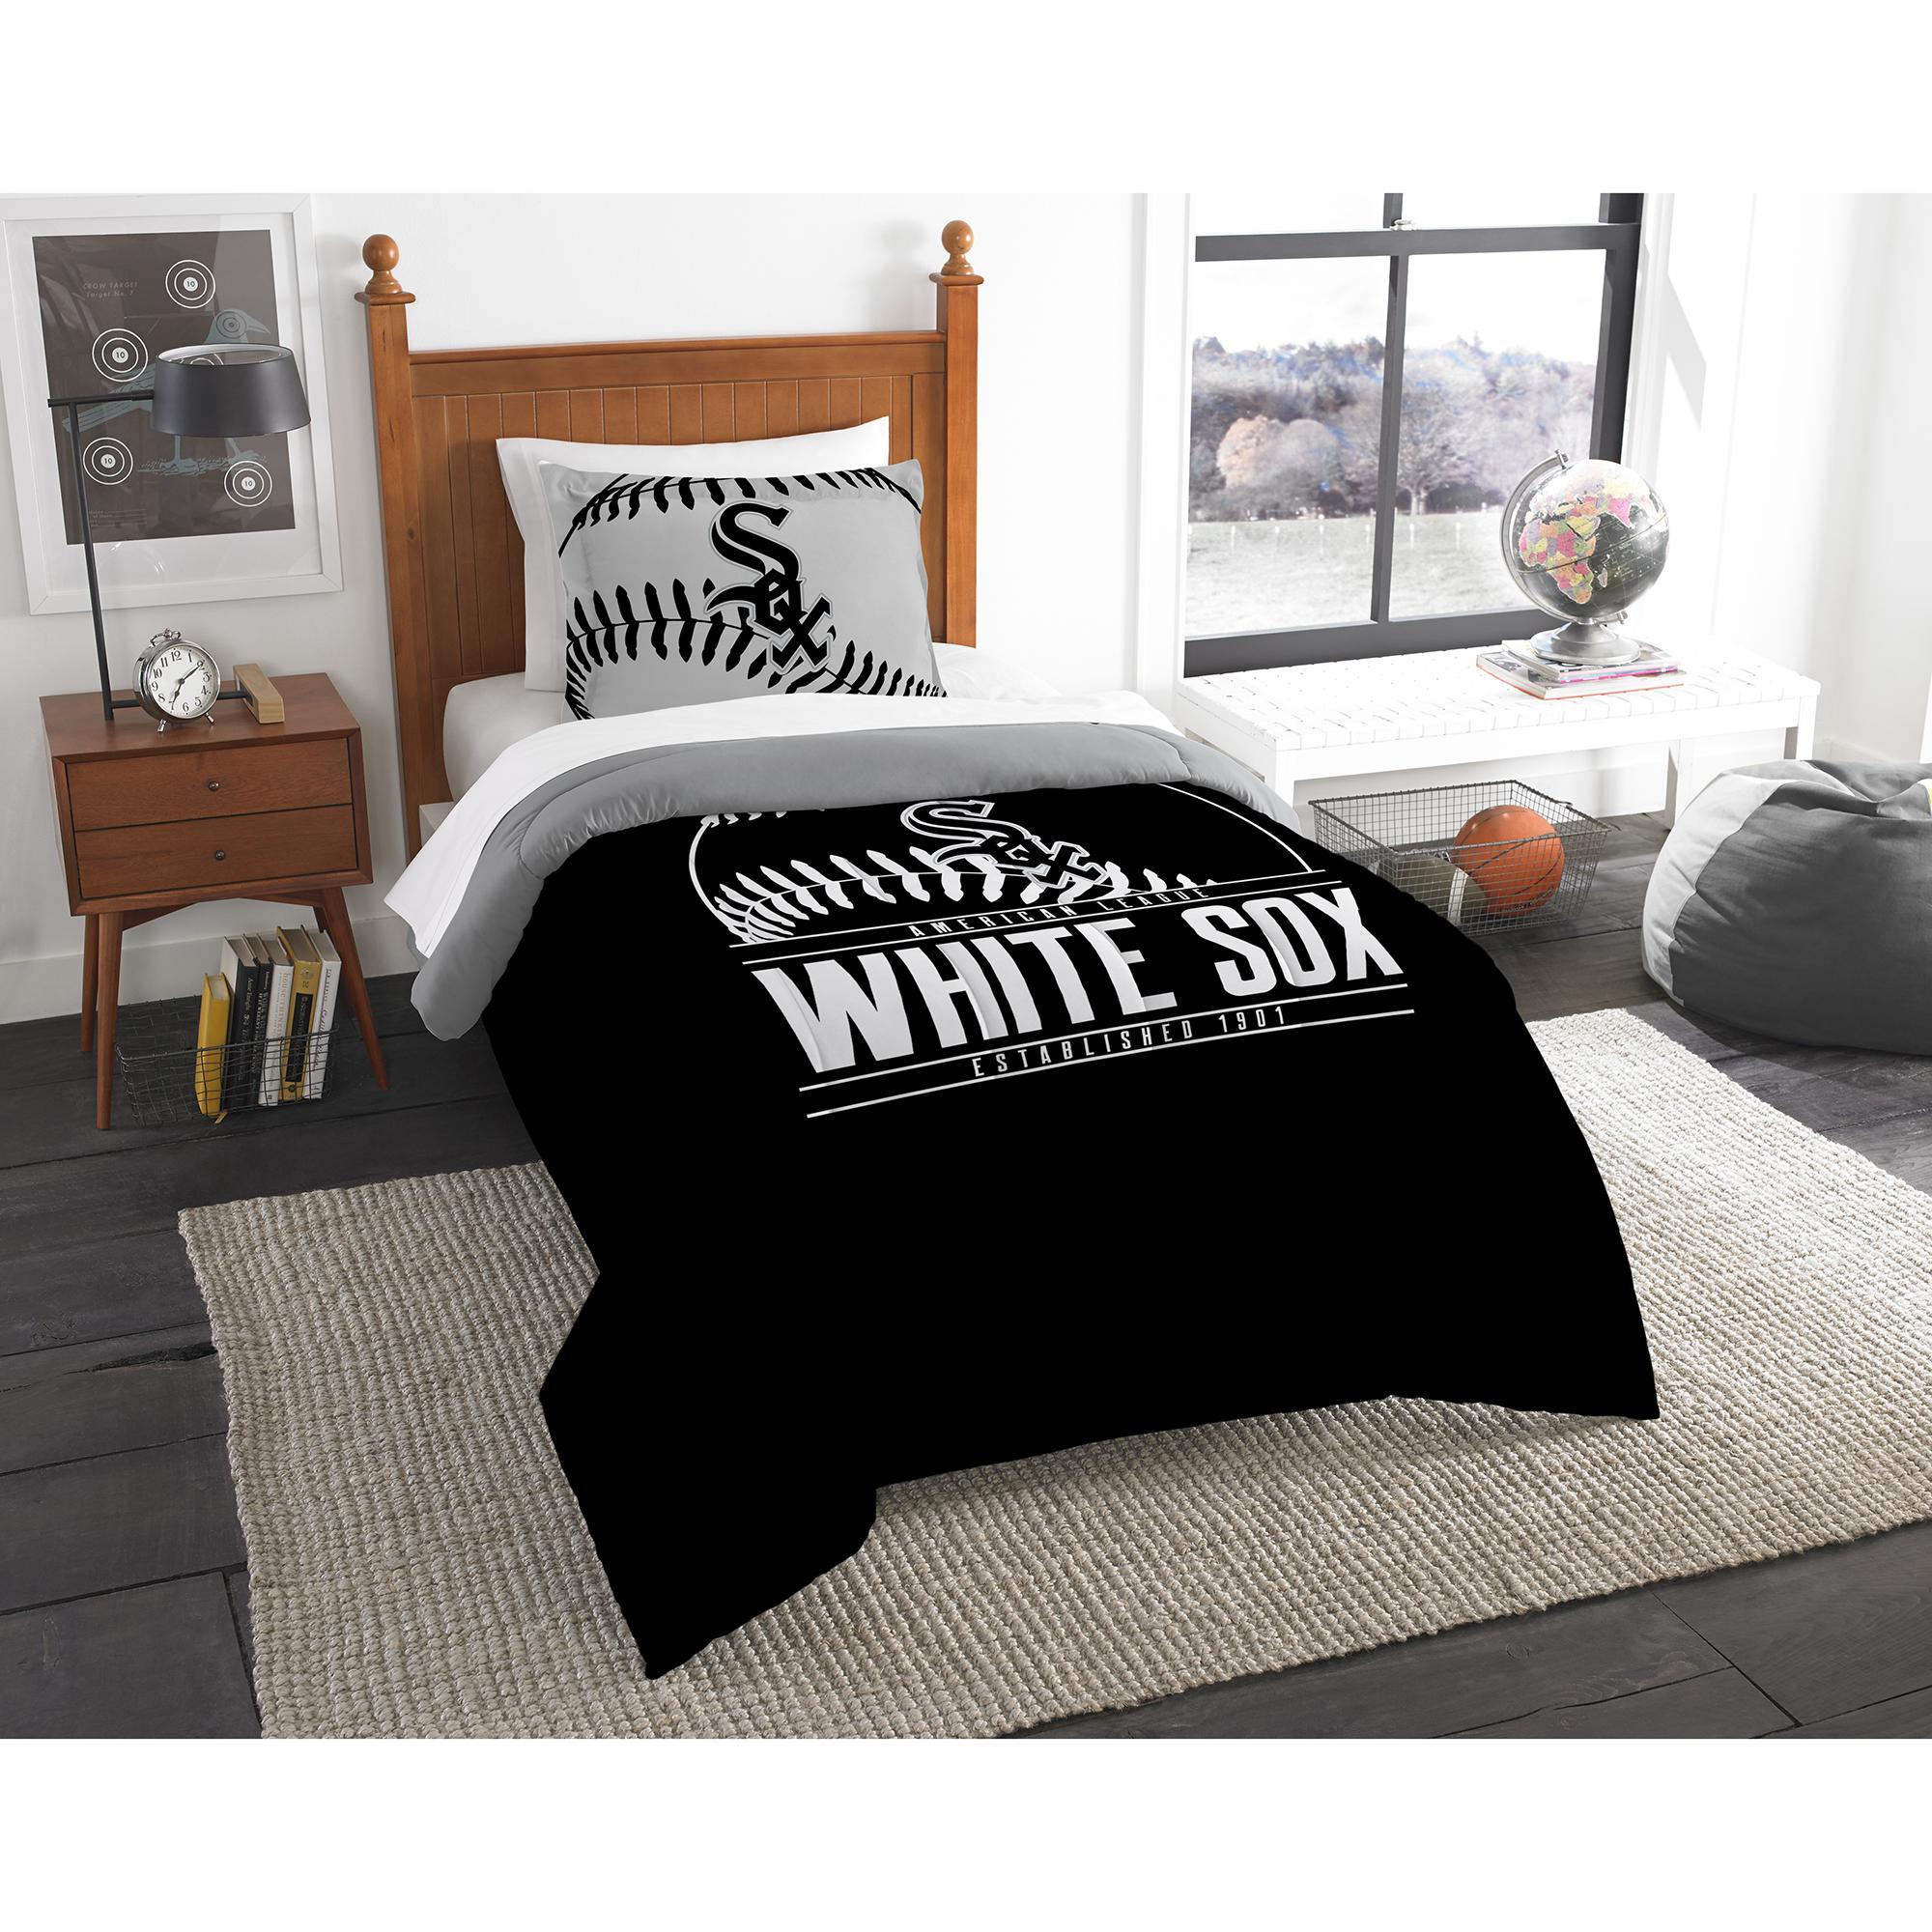 Chicago White Sox The Northwest Company Grand Slam Twin Comforter Set - No Size